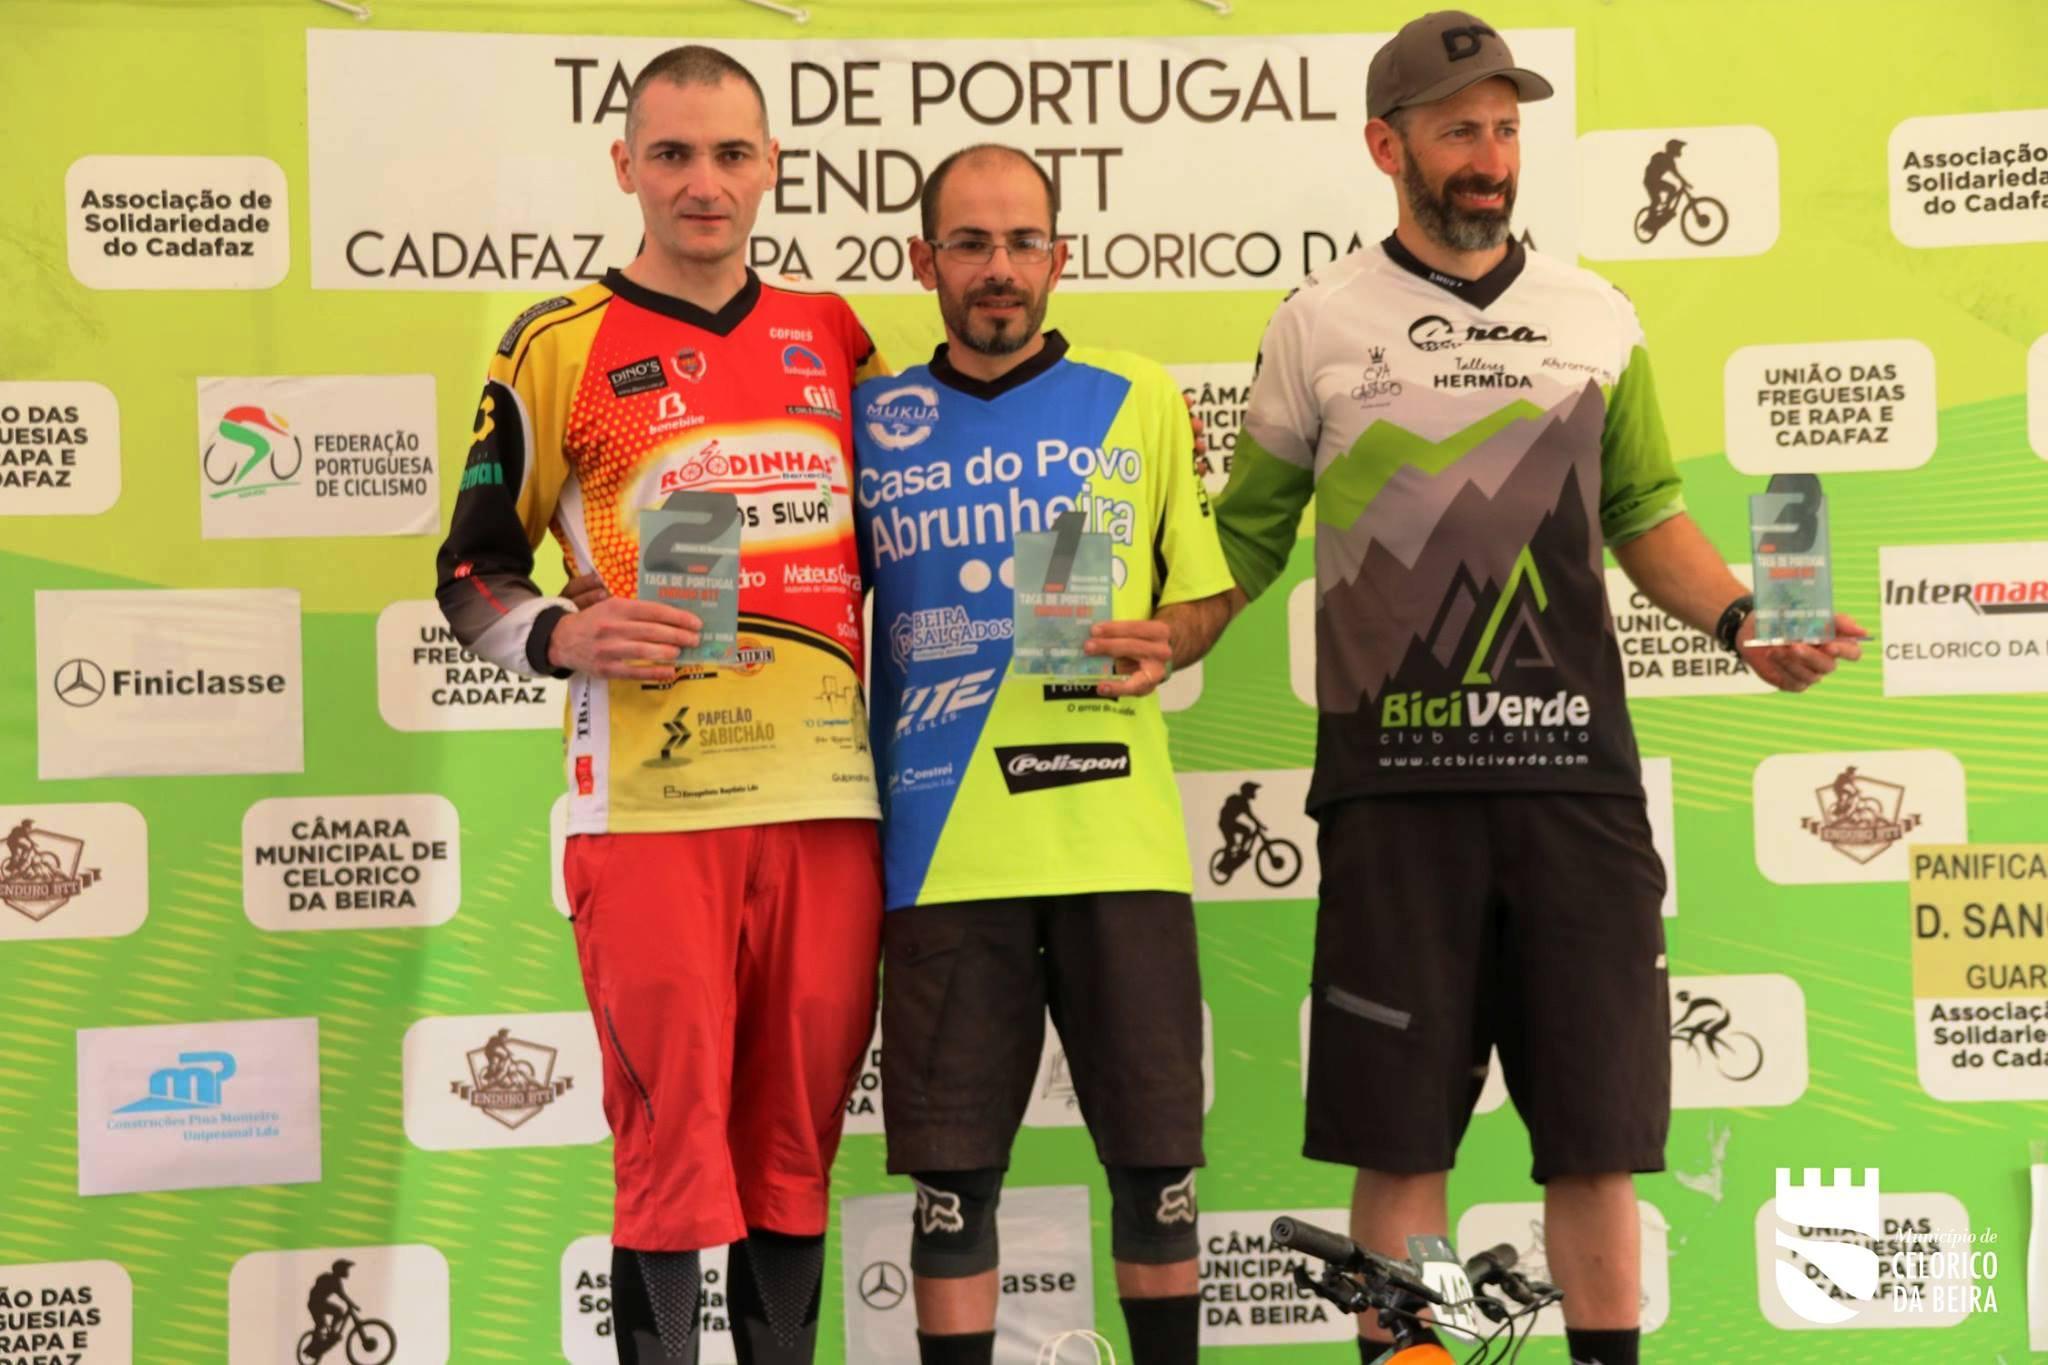 Esteban Lorenzo, 3º máster 40 en la Taça de Portugal-Enduro de Celorico da Beira